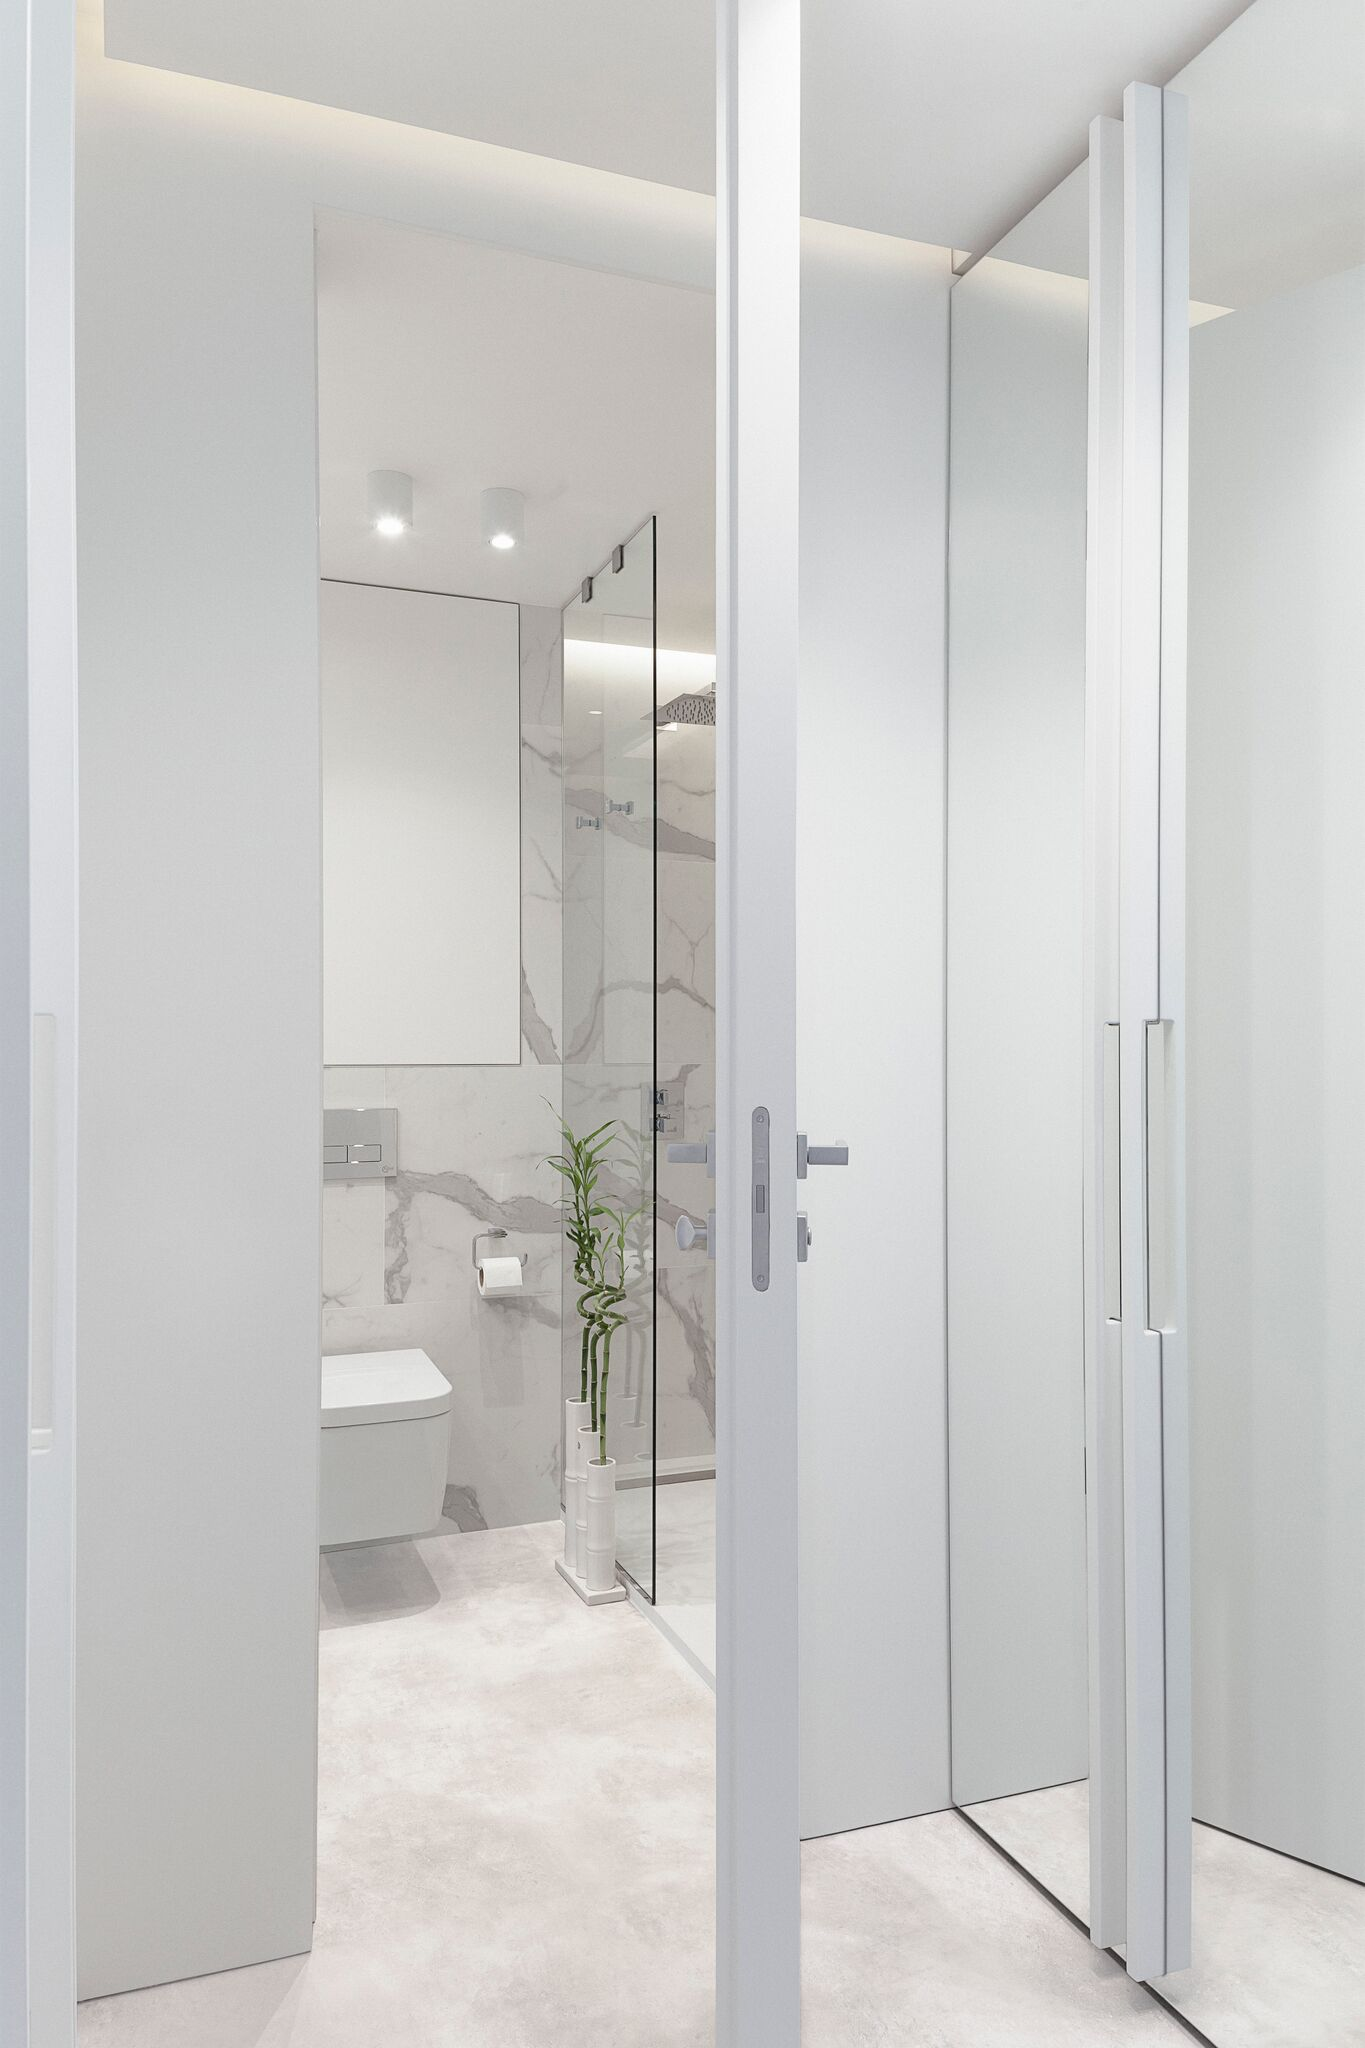 Minimalist white bathroom design